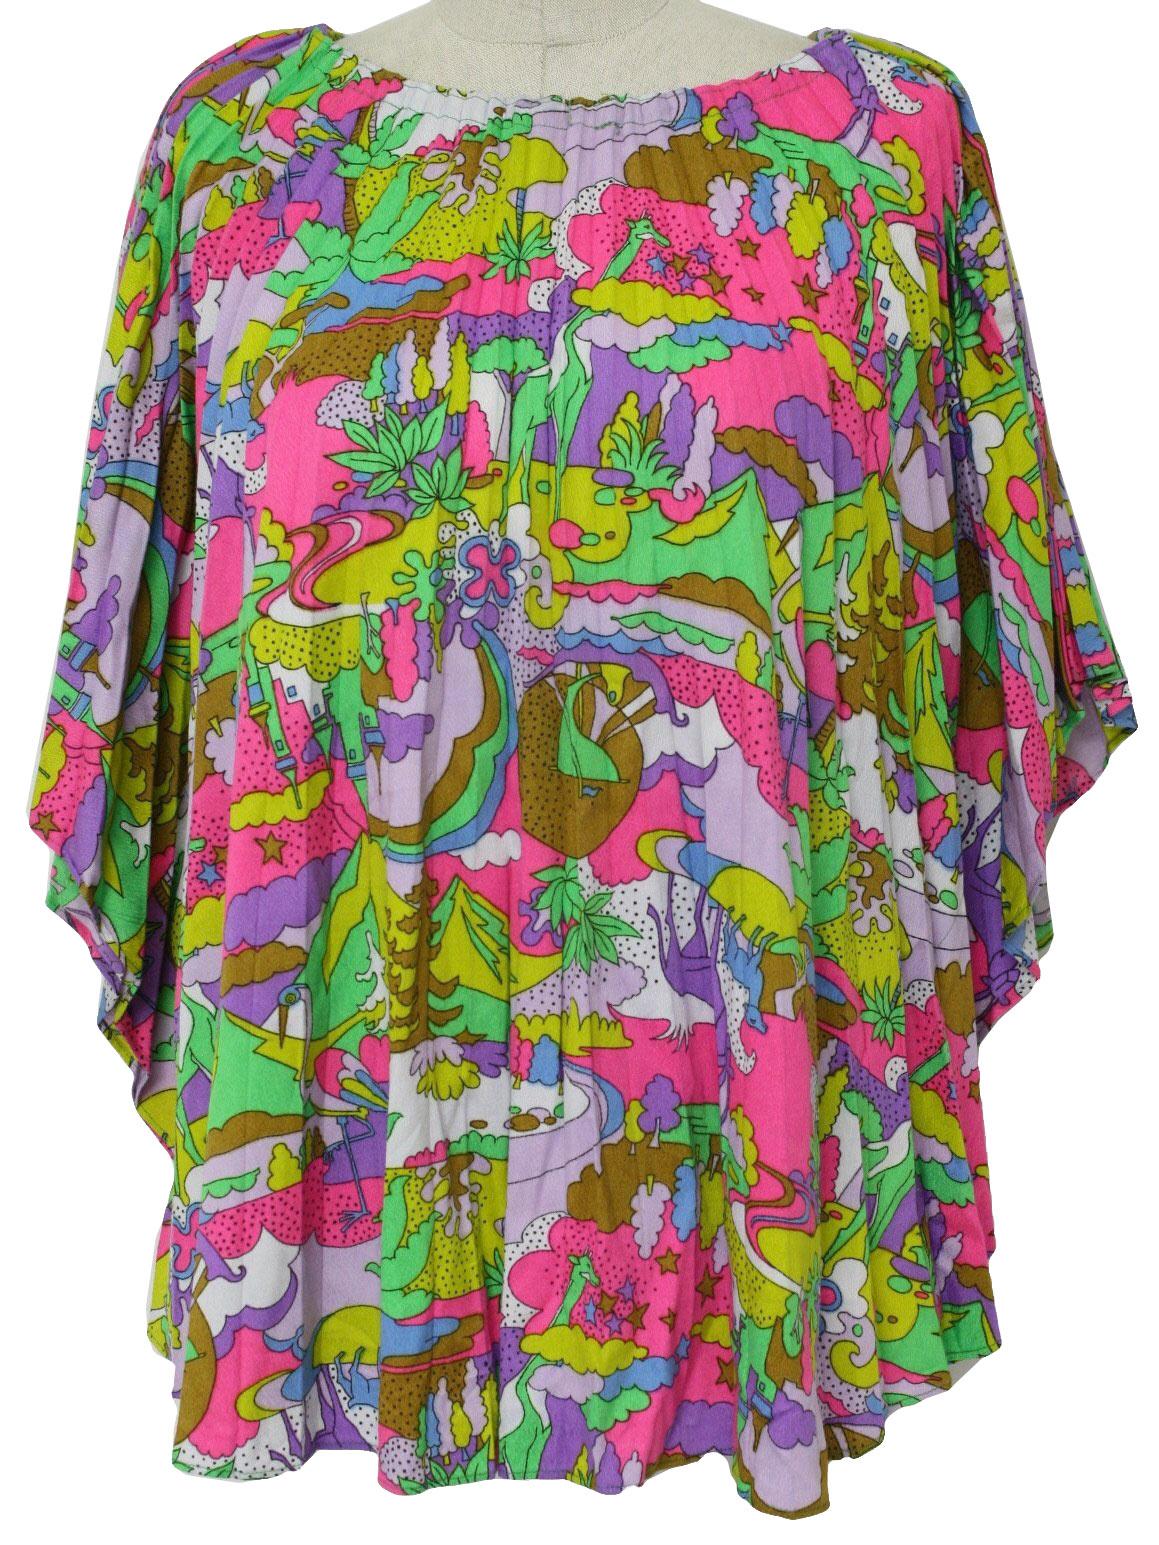 Retro 70 s Hippie Shirt  70s -Missing Label- Womens bright green ... 58bde0cbe